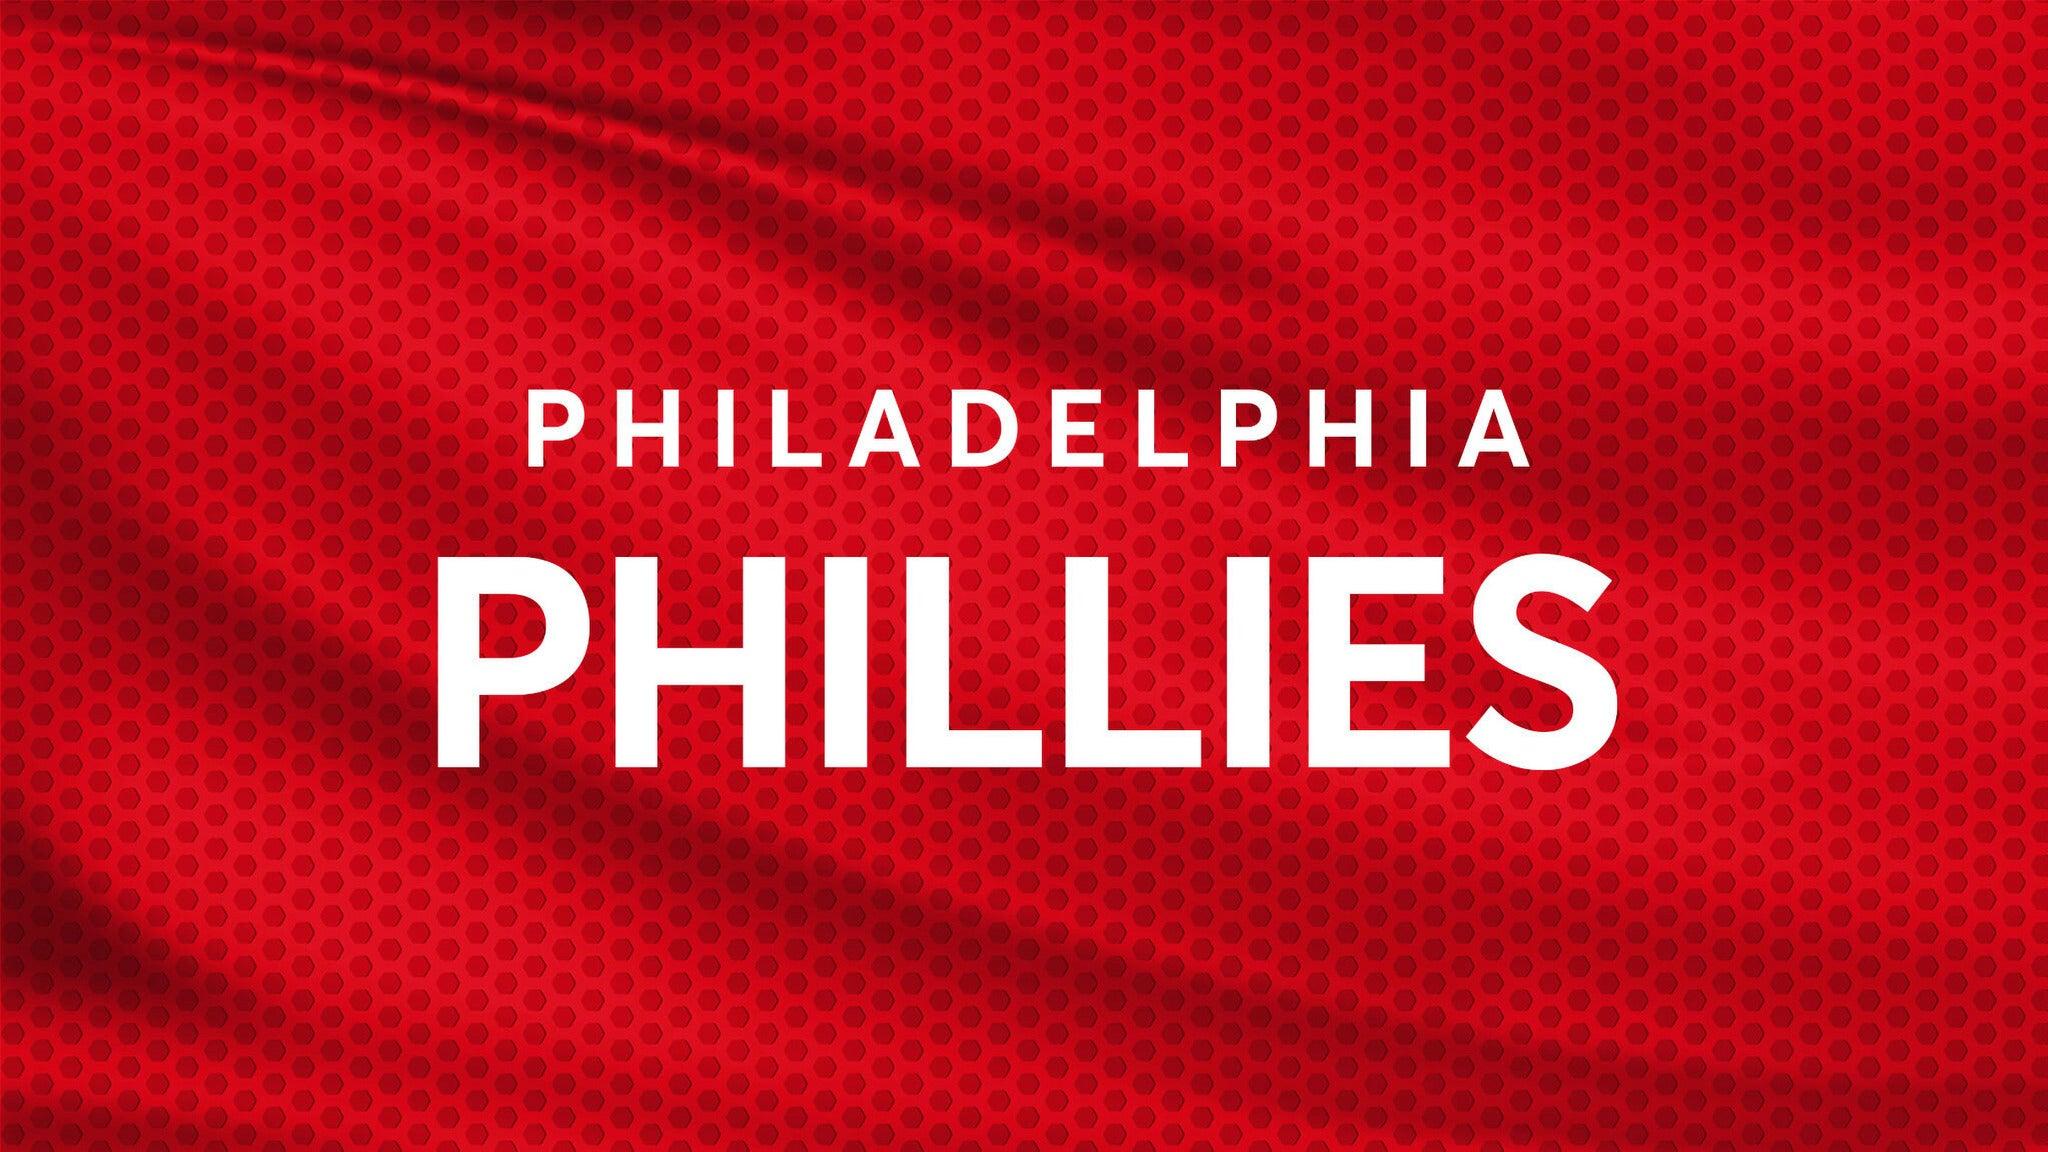 Phillies Ink Deal with SP Amaya